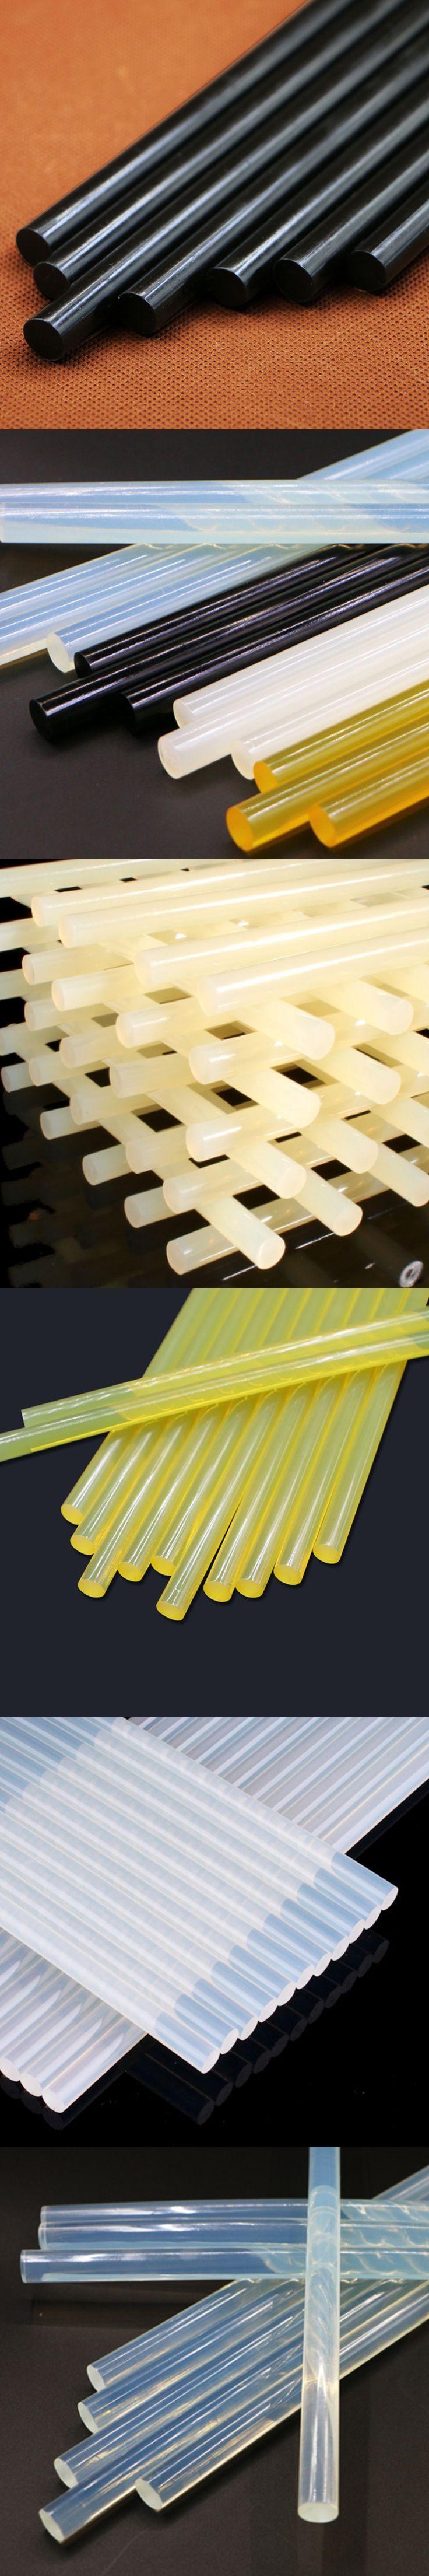 10Pcs/Set 7mm/11mm*270mm Hot Melt Adhesive Hot Melt Glue Sticks 4 Colors for Glue Gun High Viscosity Hot Glue Glue Bar